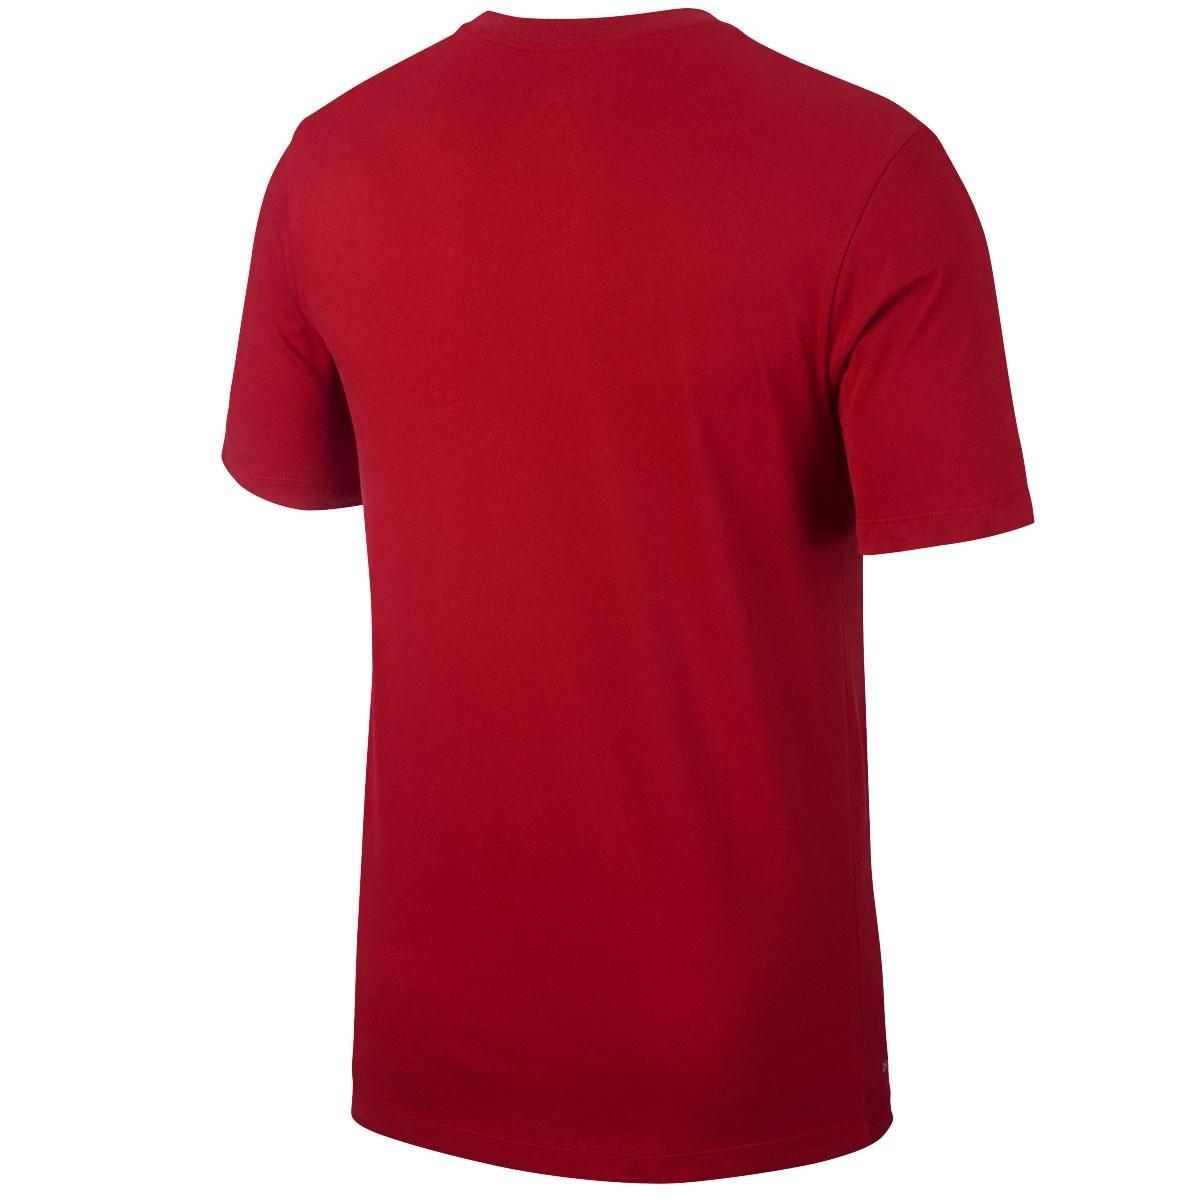 Jordan T-Shirt Streets to Stadiums 'Red' AT0560-687